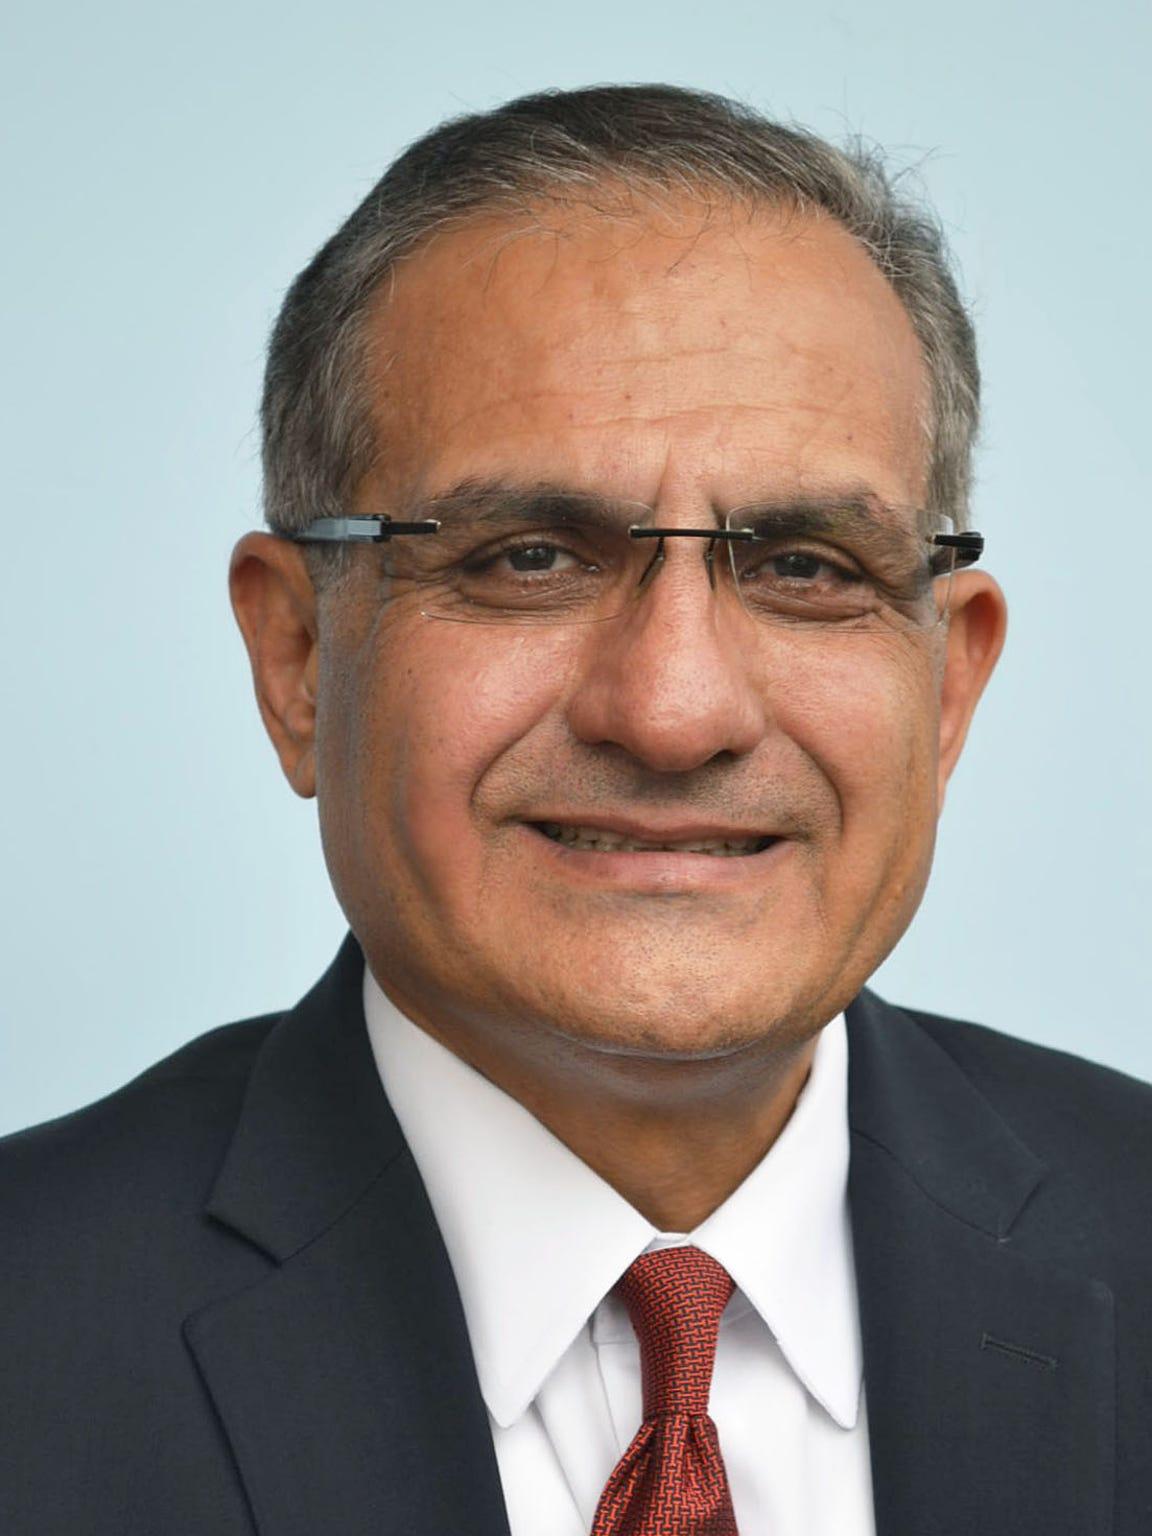 Interim City Manager Saeed Kazemi